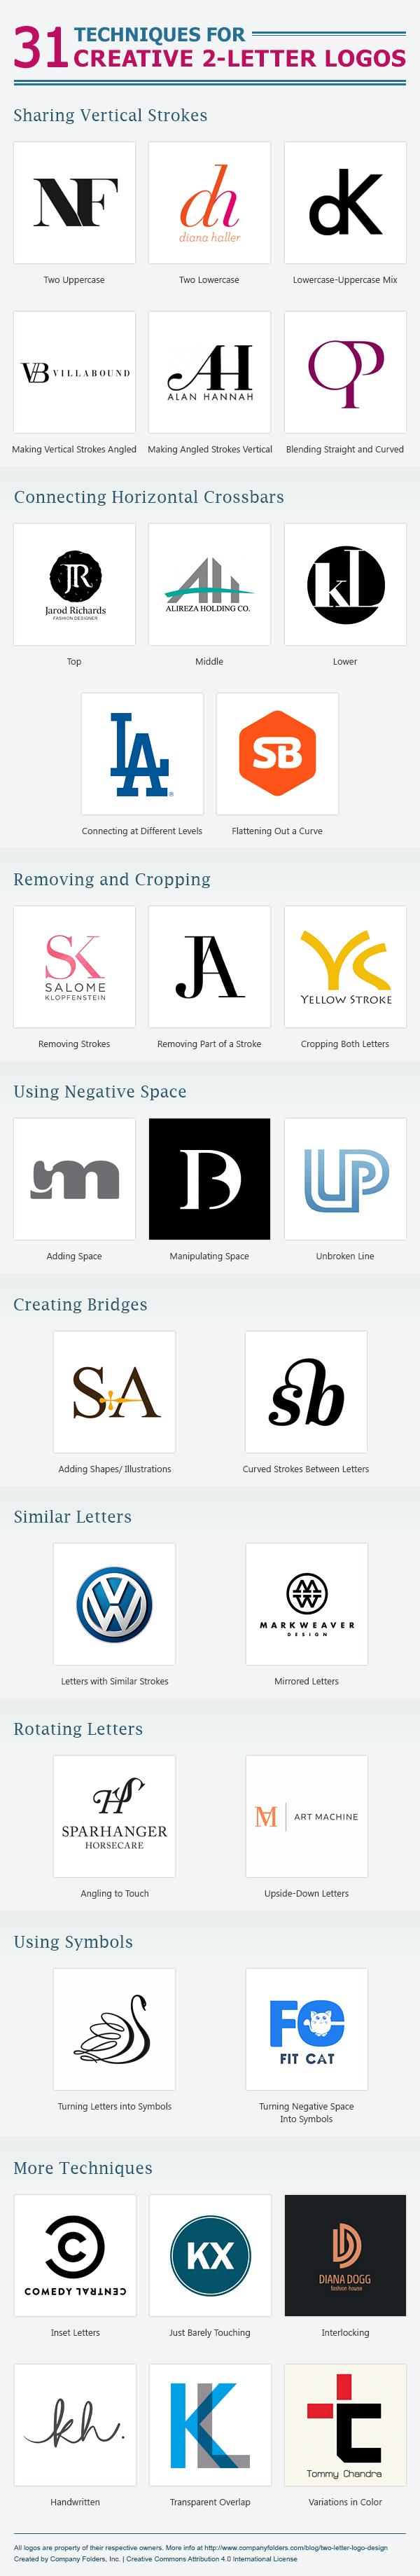 Simple Cool Logos : simple, logos, Design, Ideas, Two-Letter, Logos